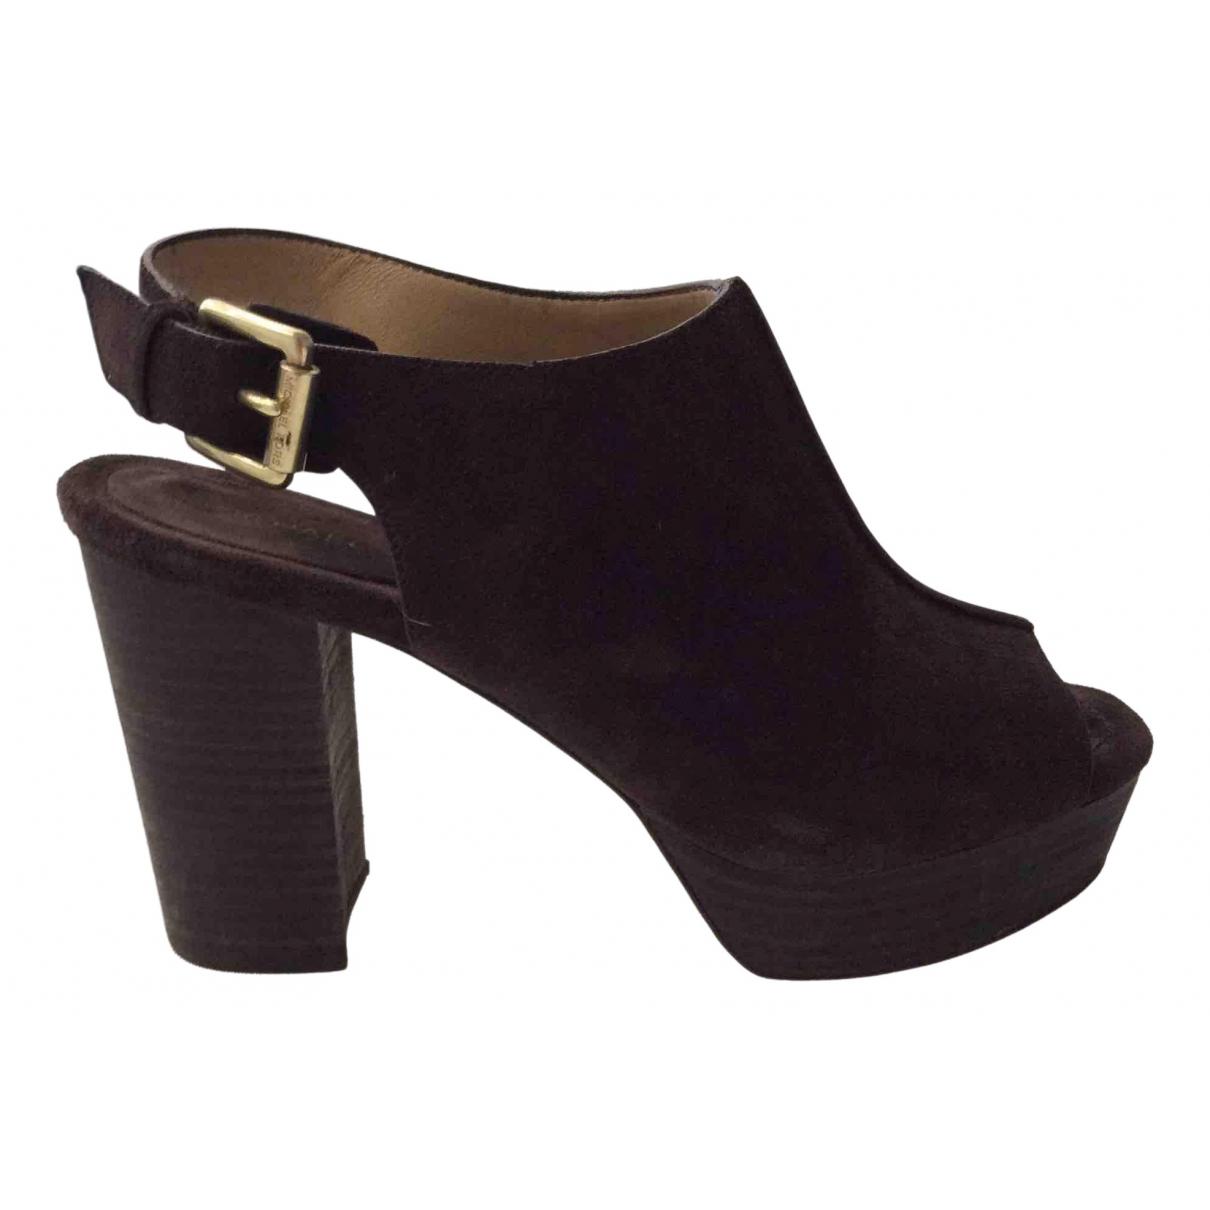 Michael Kors \N Brown Suede Sandals for Women 6.5 US